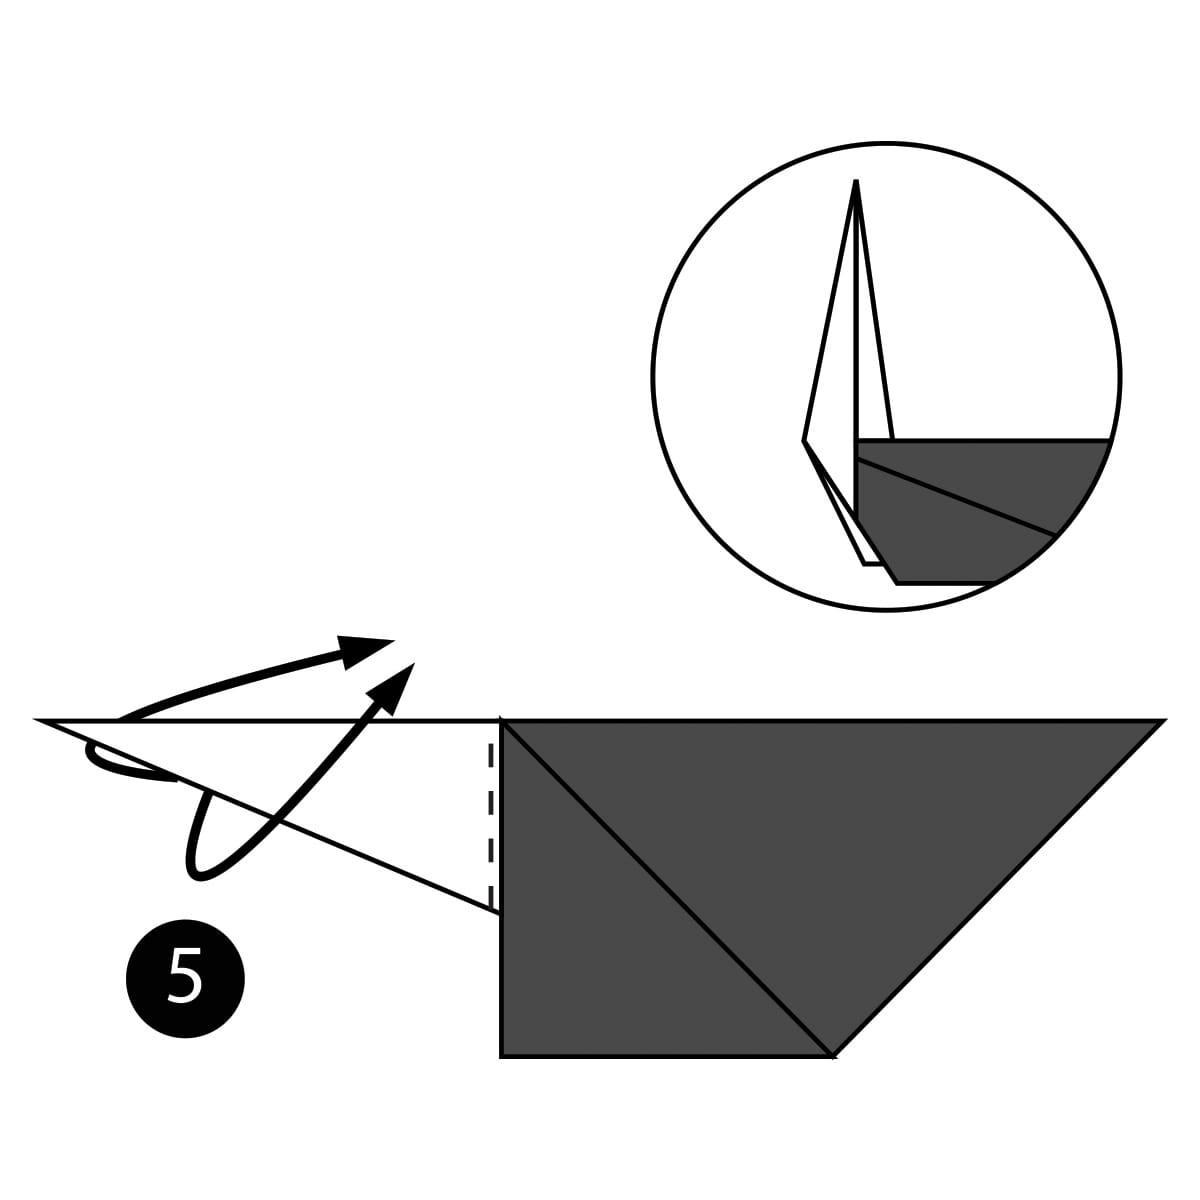 Ostrich Step 5